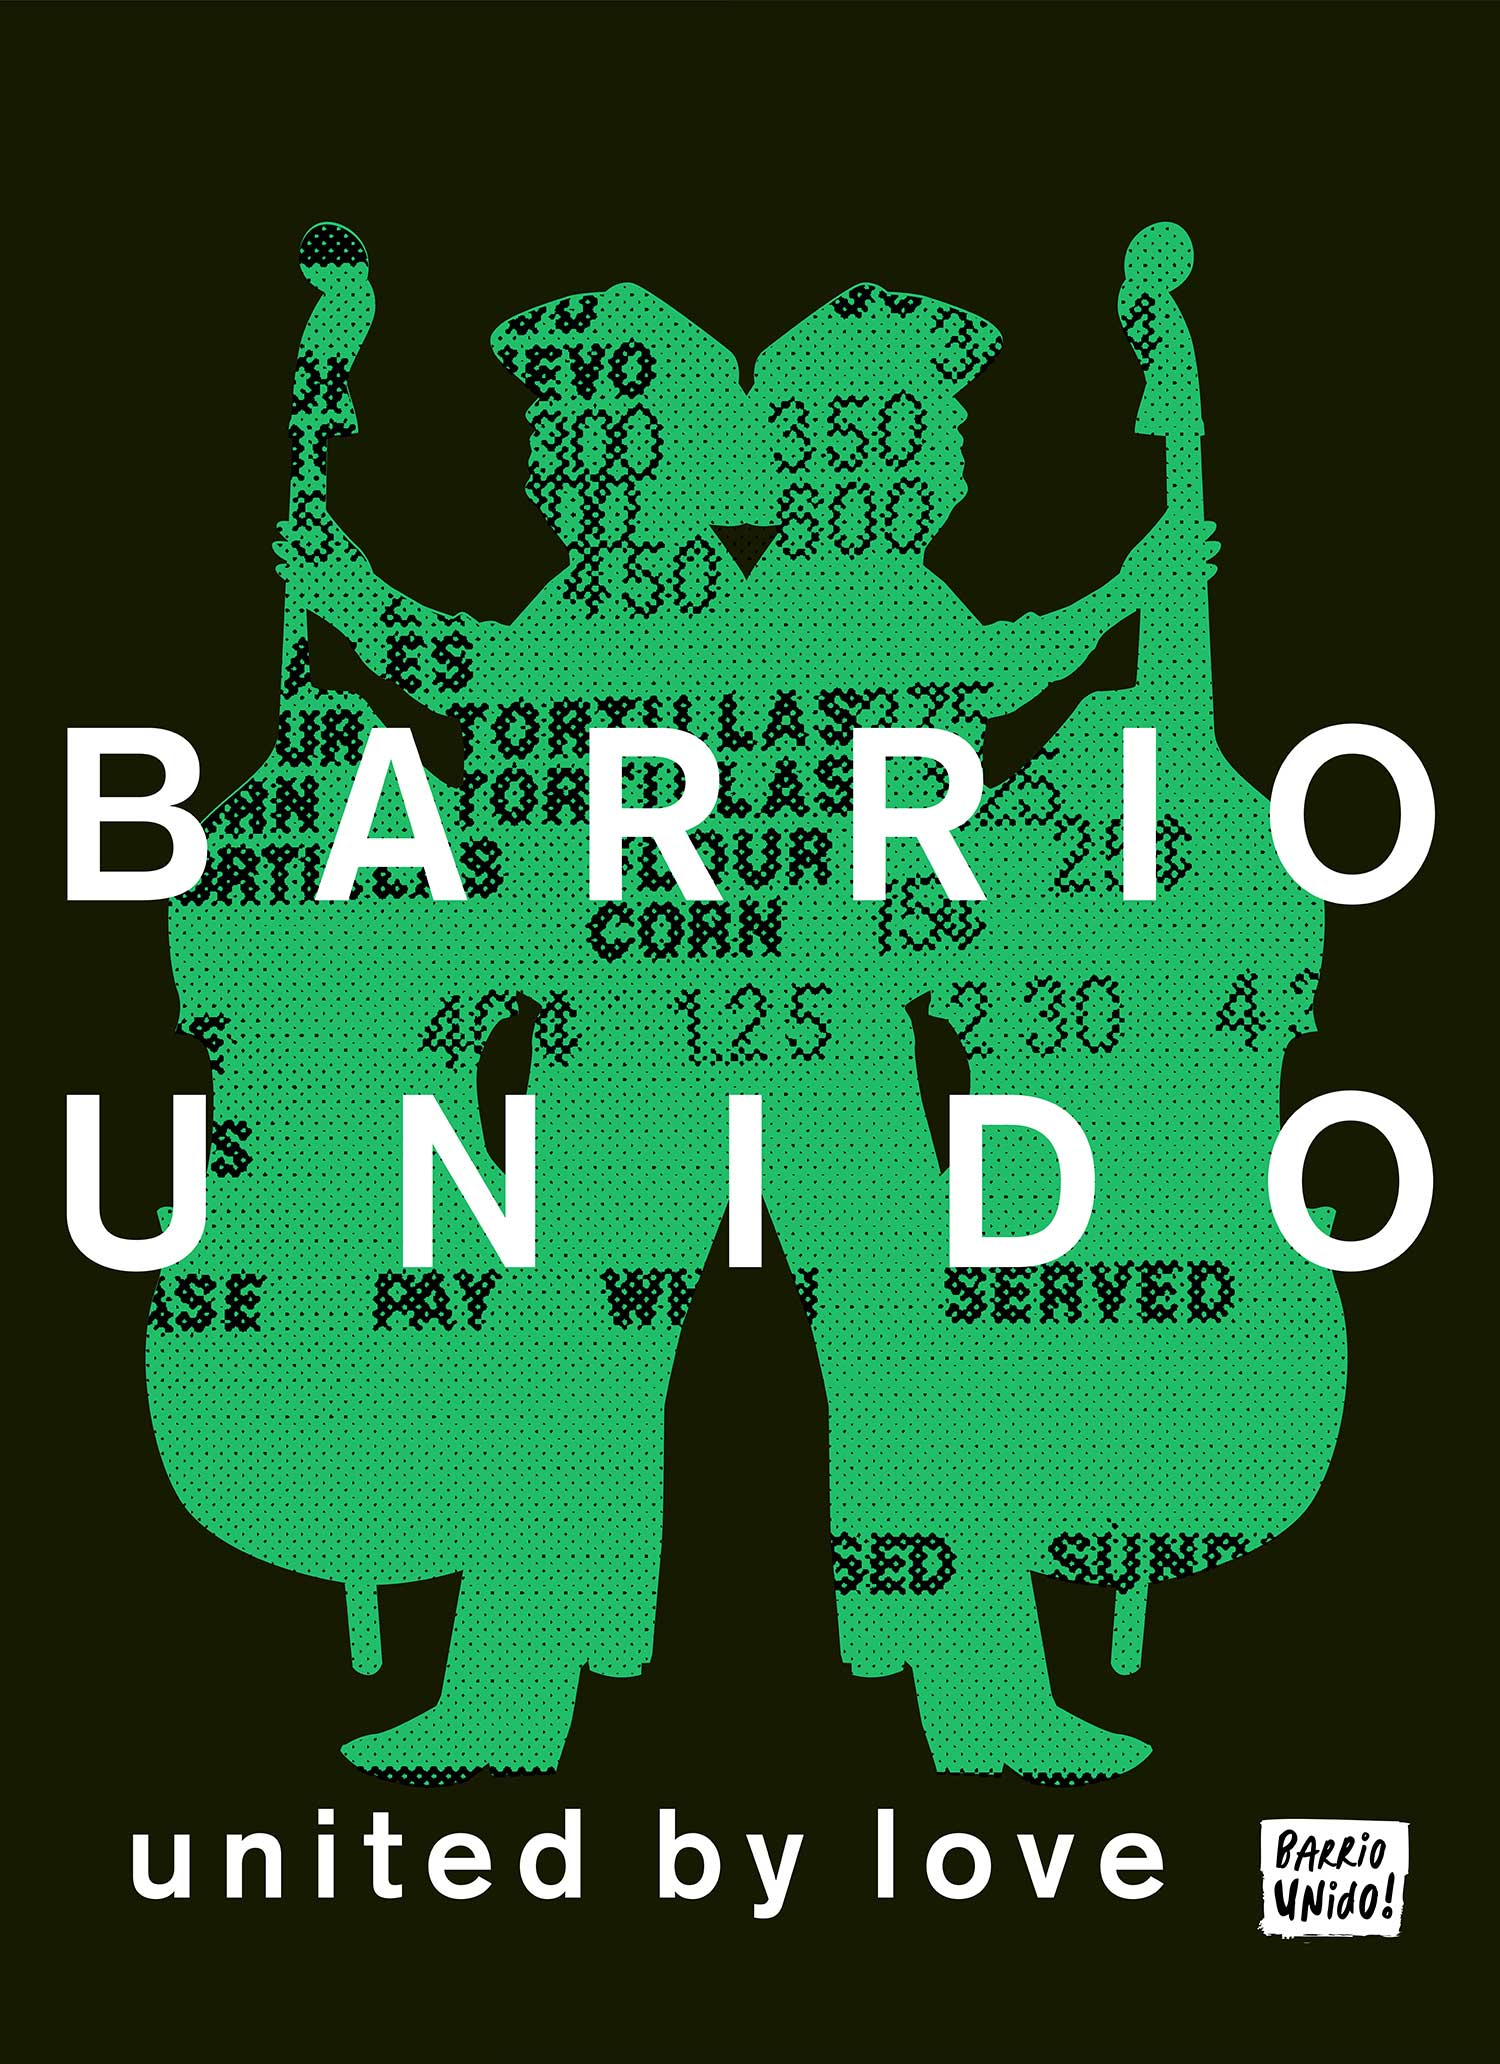 ron-miriello-grafico-barrio-logan-posters-san-diego-community-design-Miriello-branding-officina-05.jpg